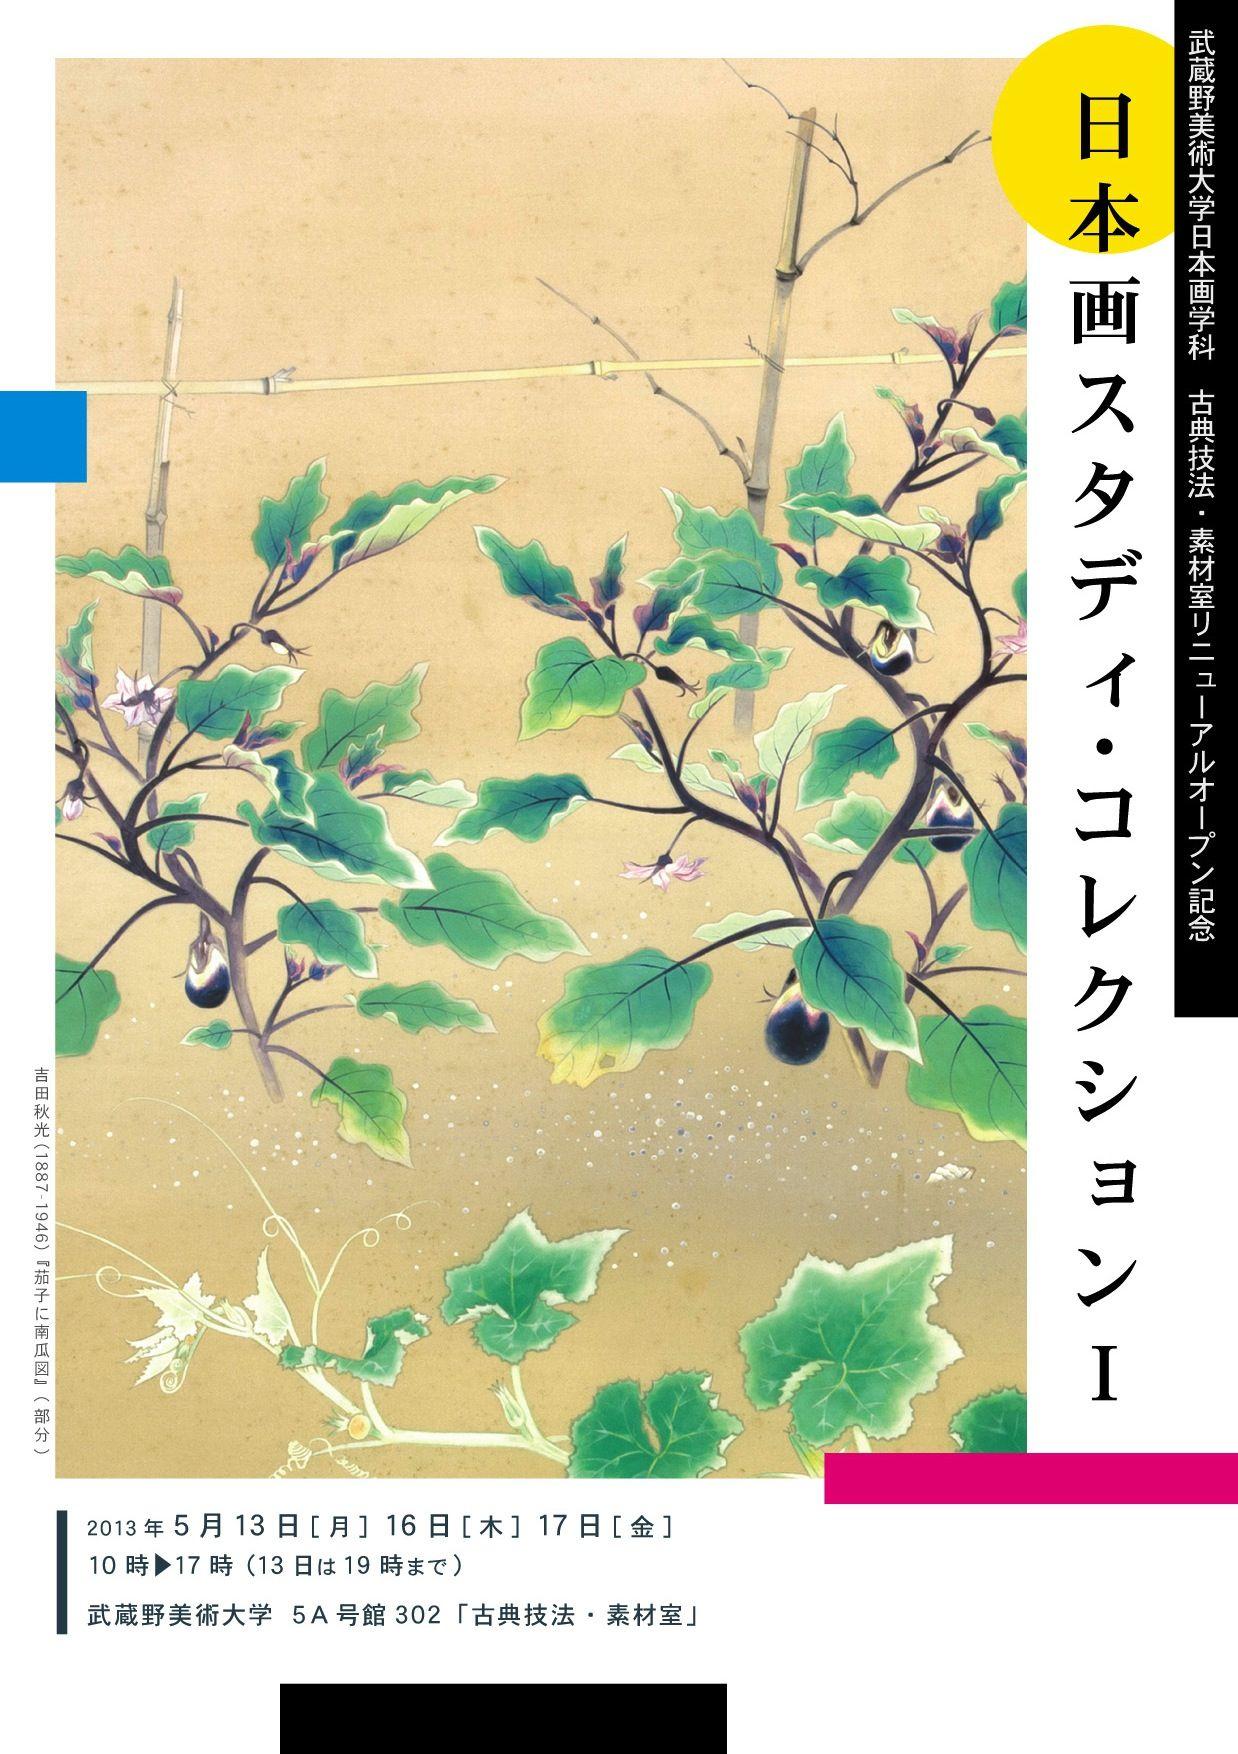 http://nihonga.musabi.ac.jp/wp-content/uploads/2013/06/study1.jpg